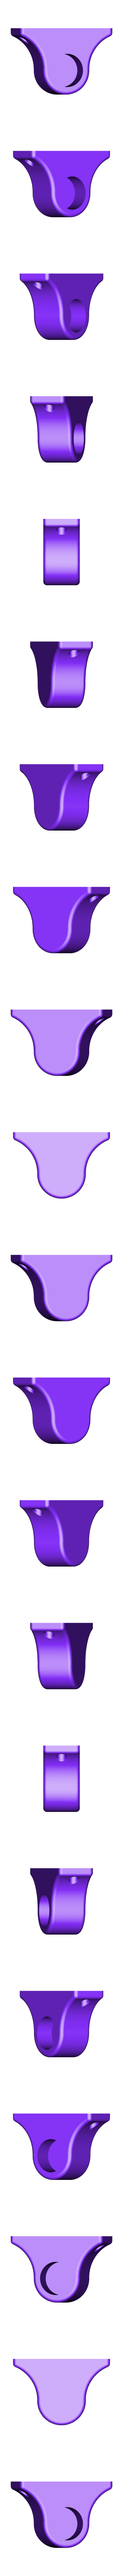 End_cap_small.STL Download free STL file Hook & Hanger System • 3D printing object, Festus440